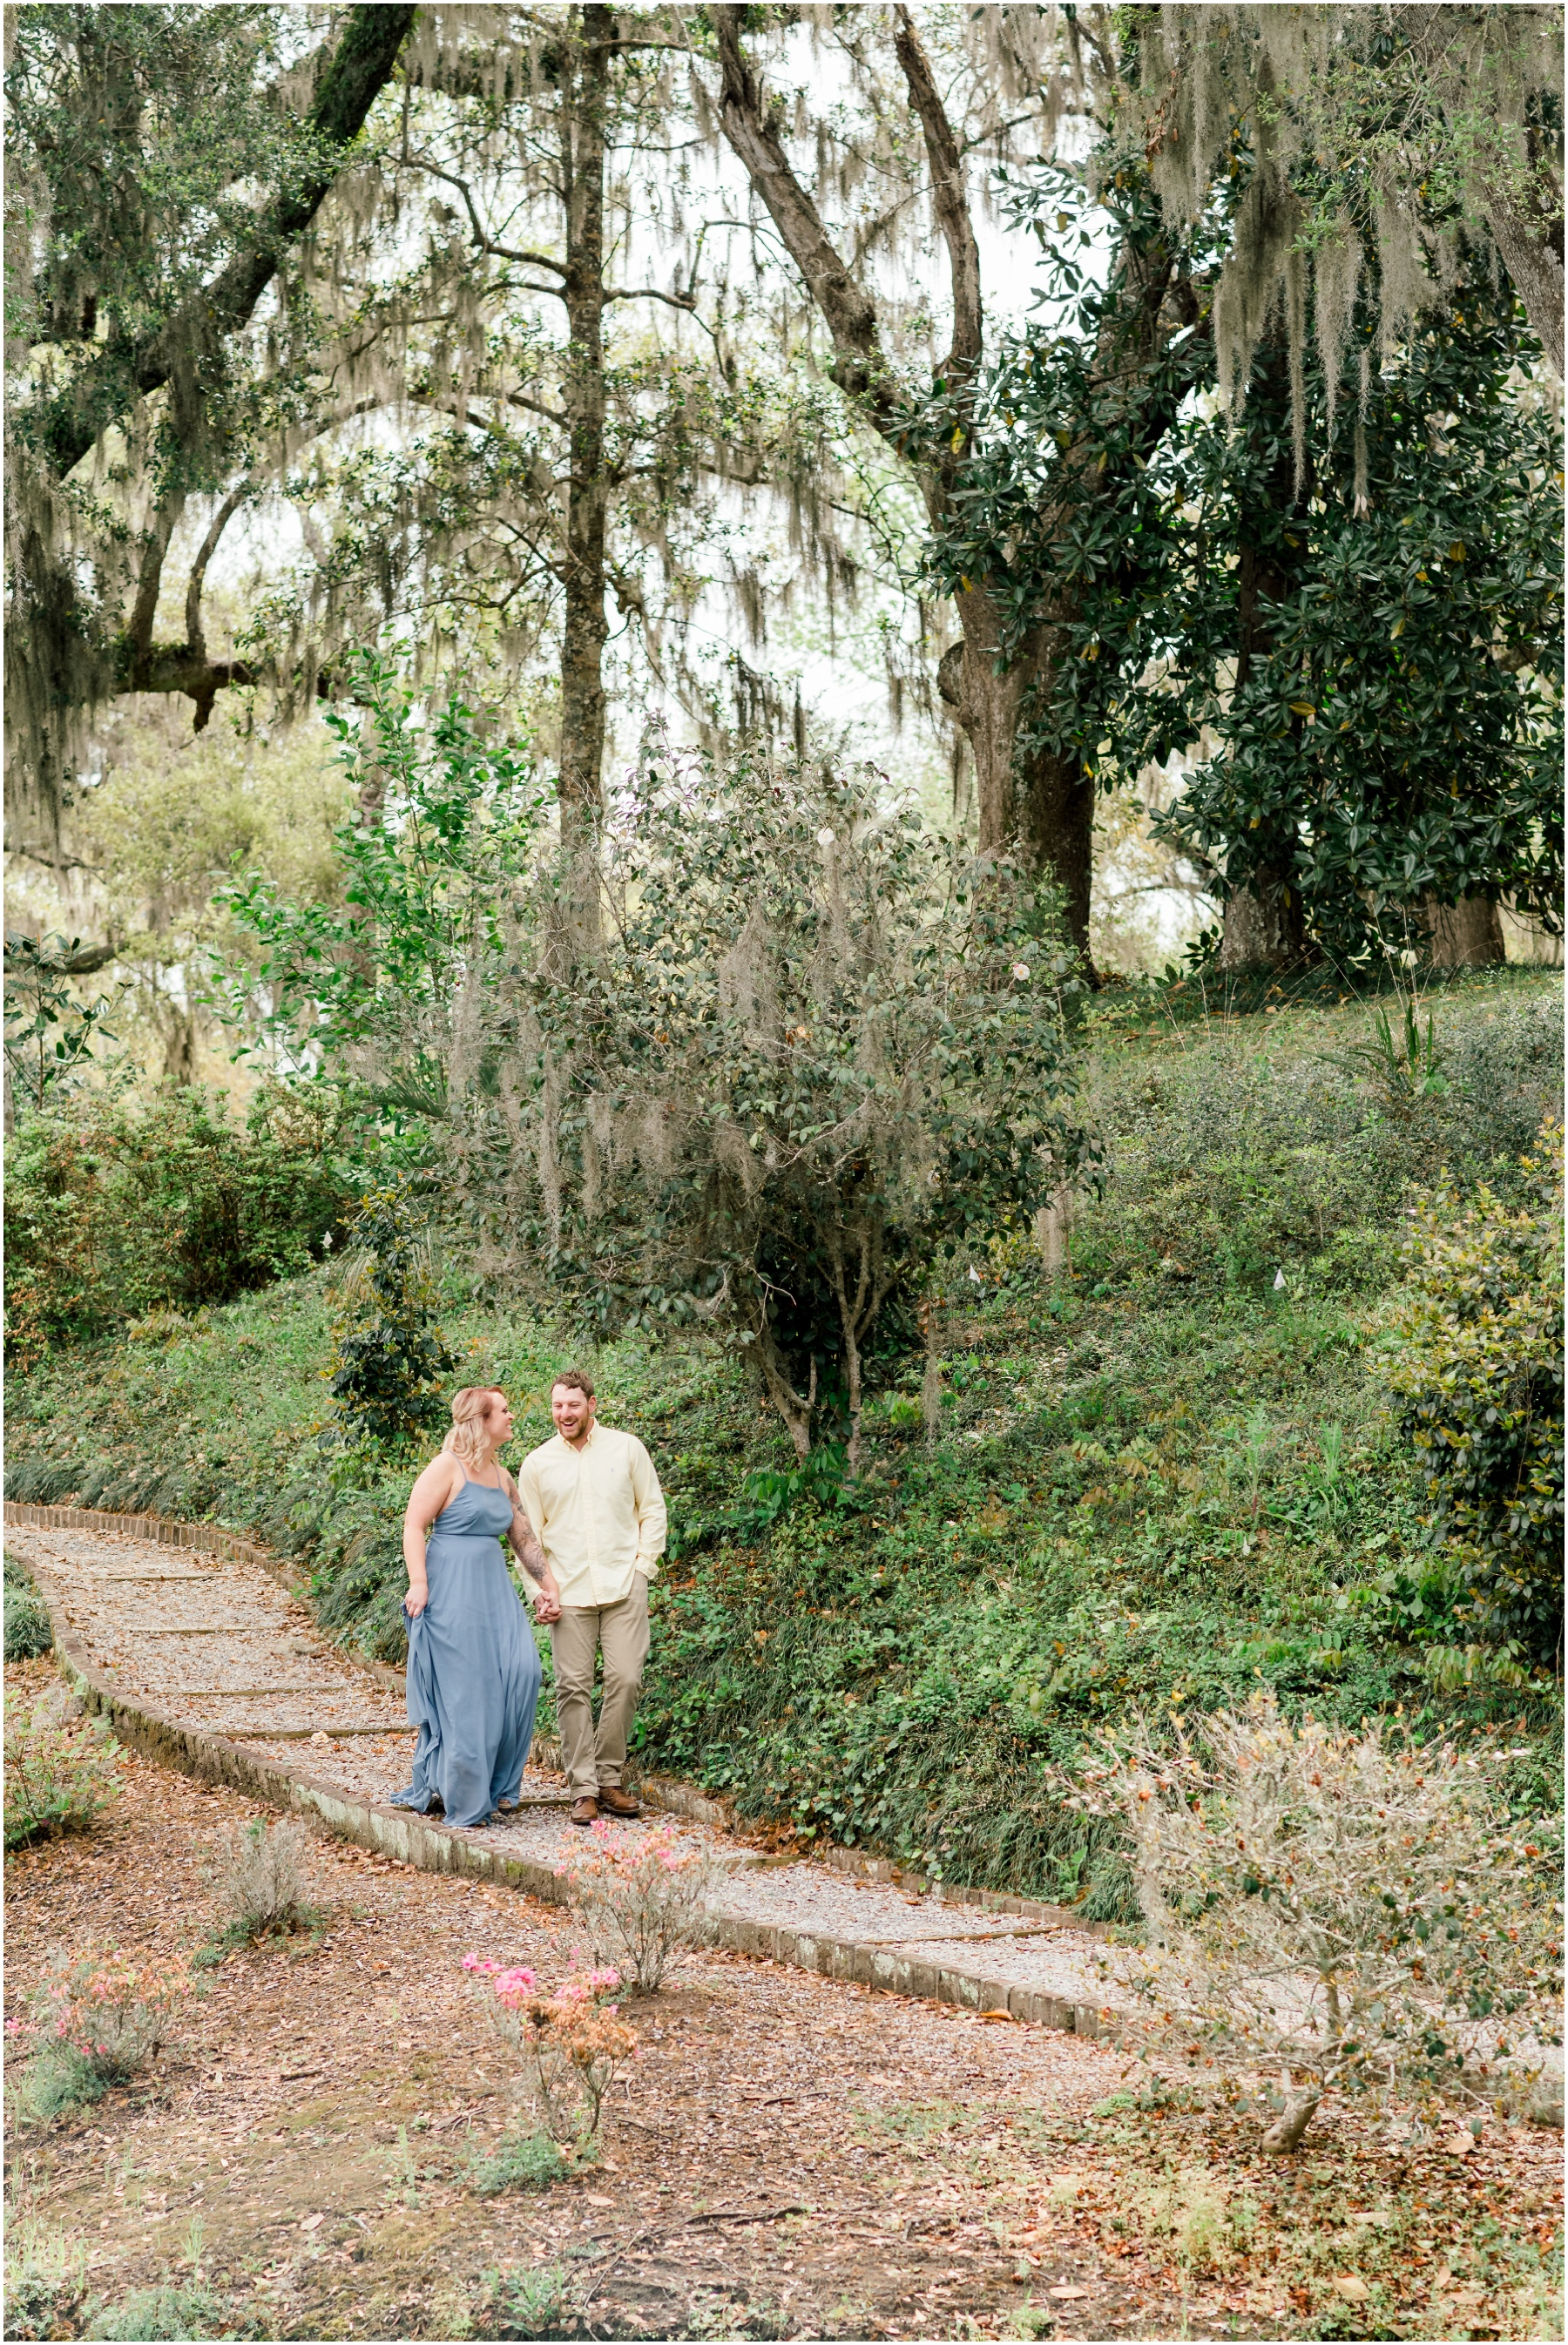 Mepkin-Abbey-Moncks-Corner-South-Carolina-Engagement-Session-Photos_0022.jpg